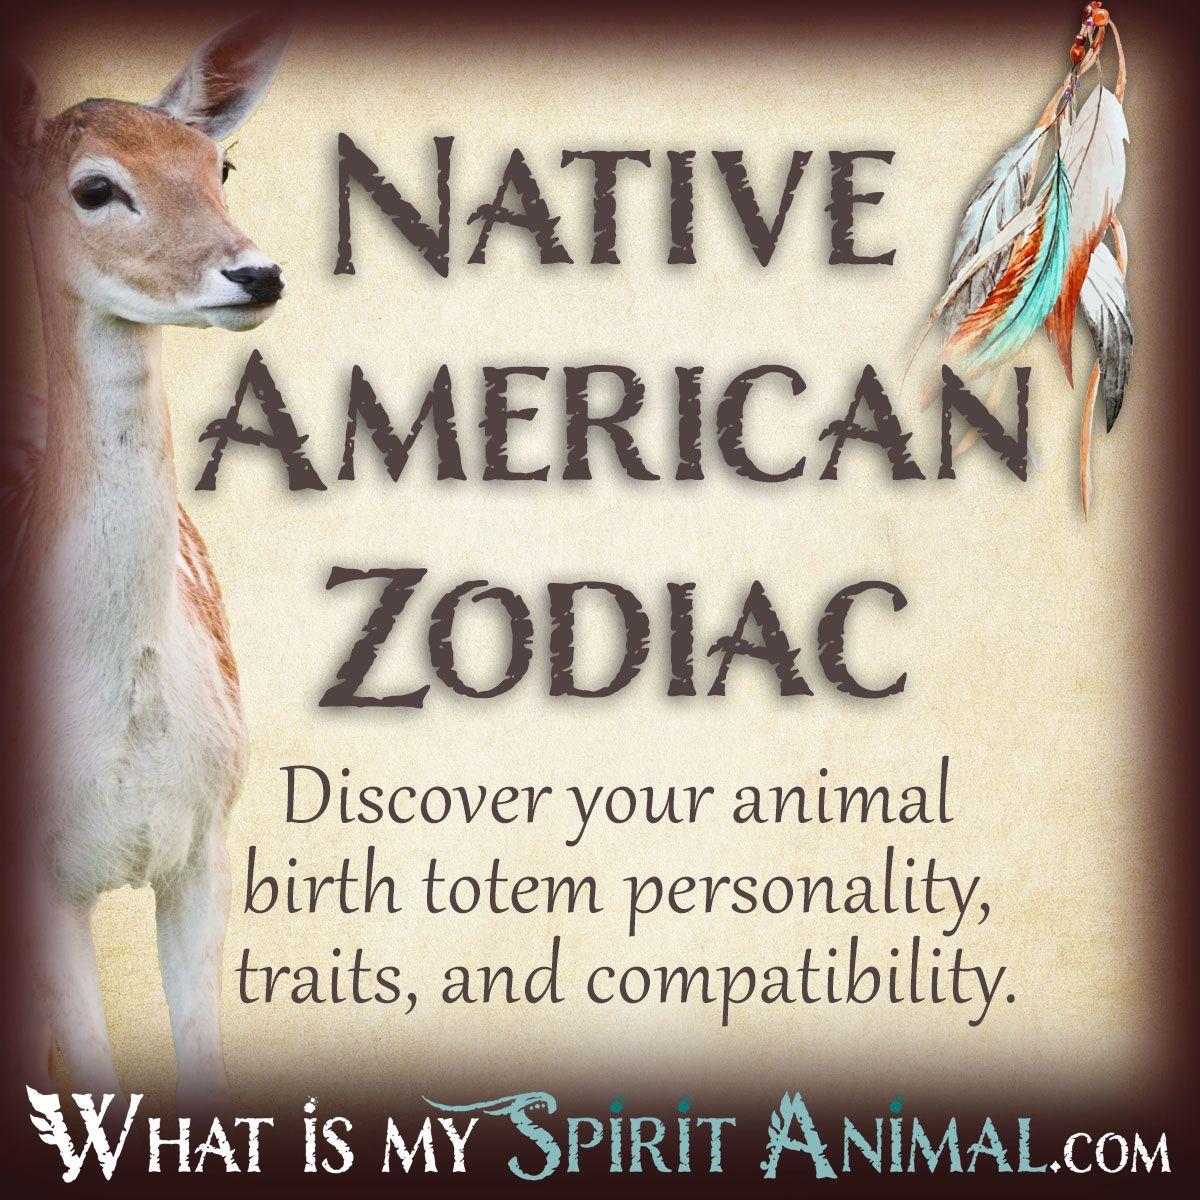 Native American Zodiac & Astrology Native american